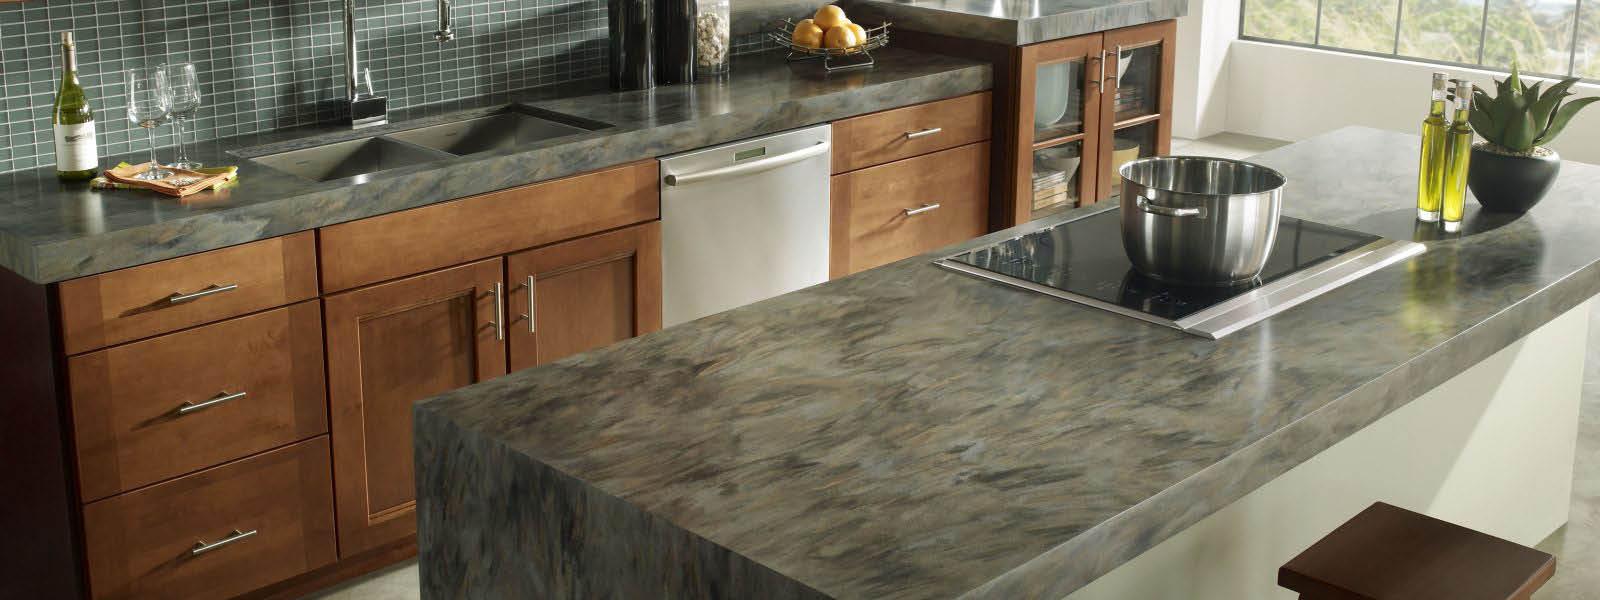 countertop cambria quartz granite